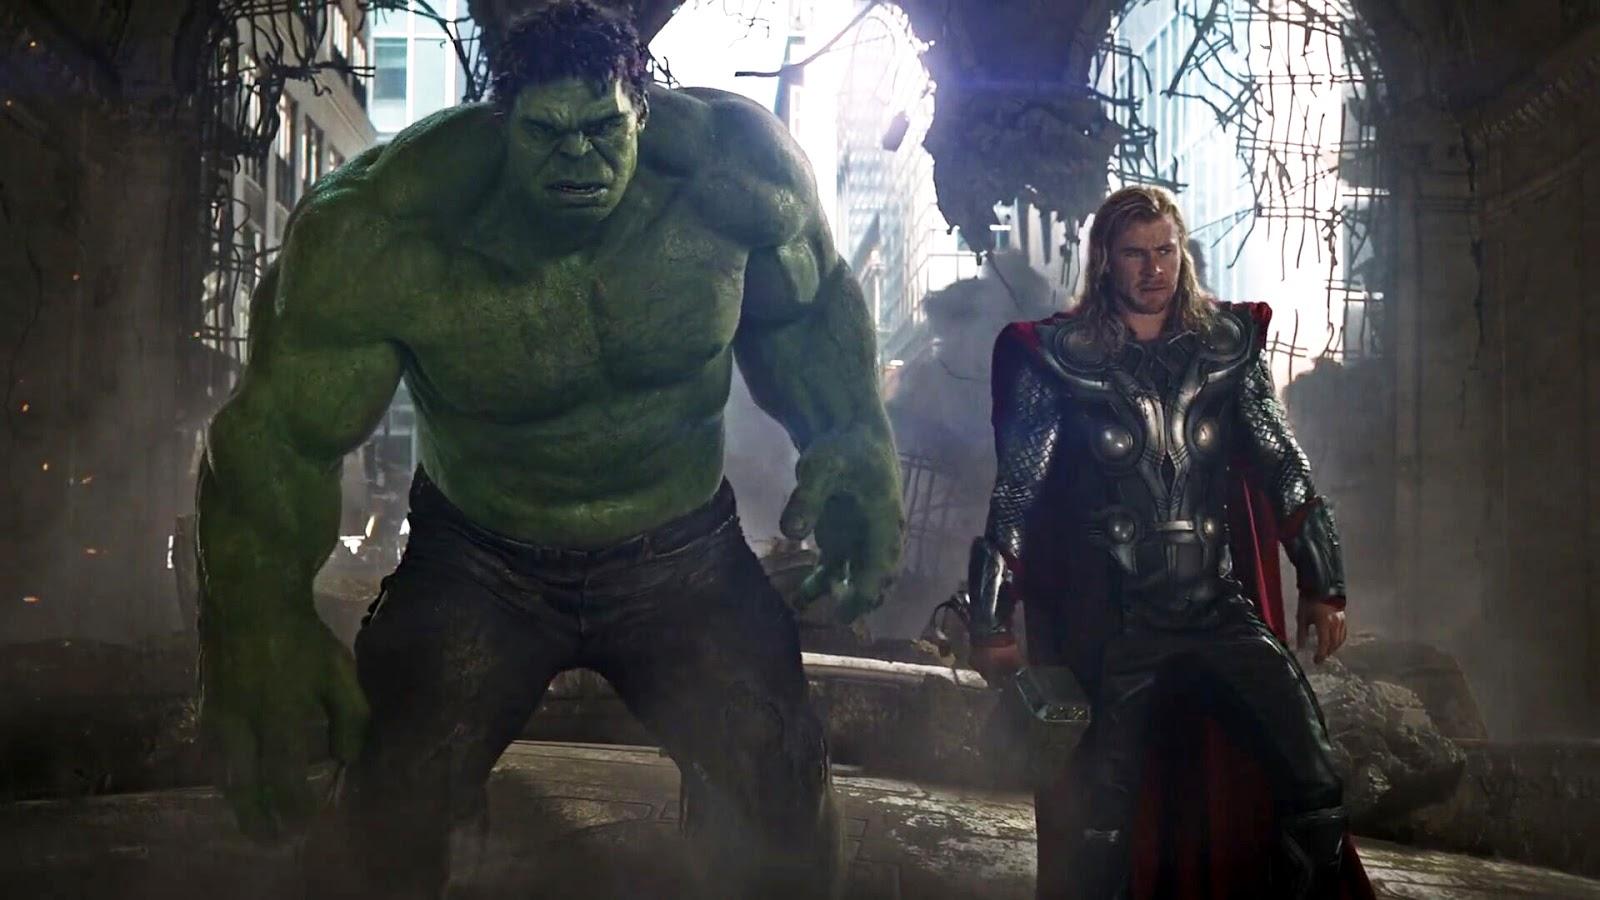 The Similarities between Avengers Thor and Endgame Cap :「アベンジャーズ」の第1作めの雷神ソーと「エンドゲーム」のキャプテン・アメリカのムジョルニアを使ったバトルの殺陣は同じ ! ! というマーベル・ファンの鋭い指摘 ! !